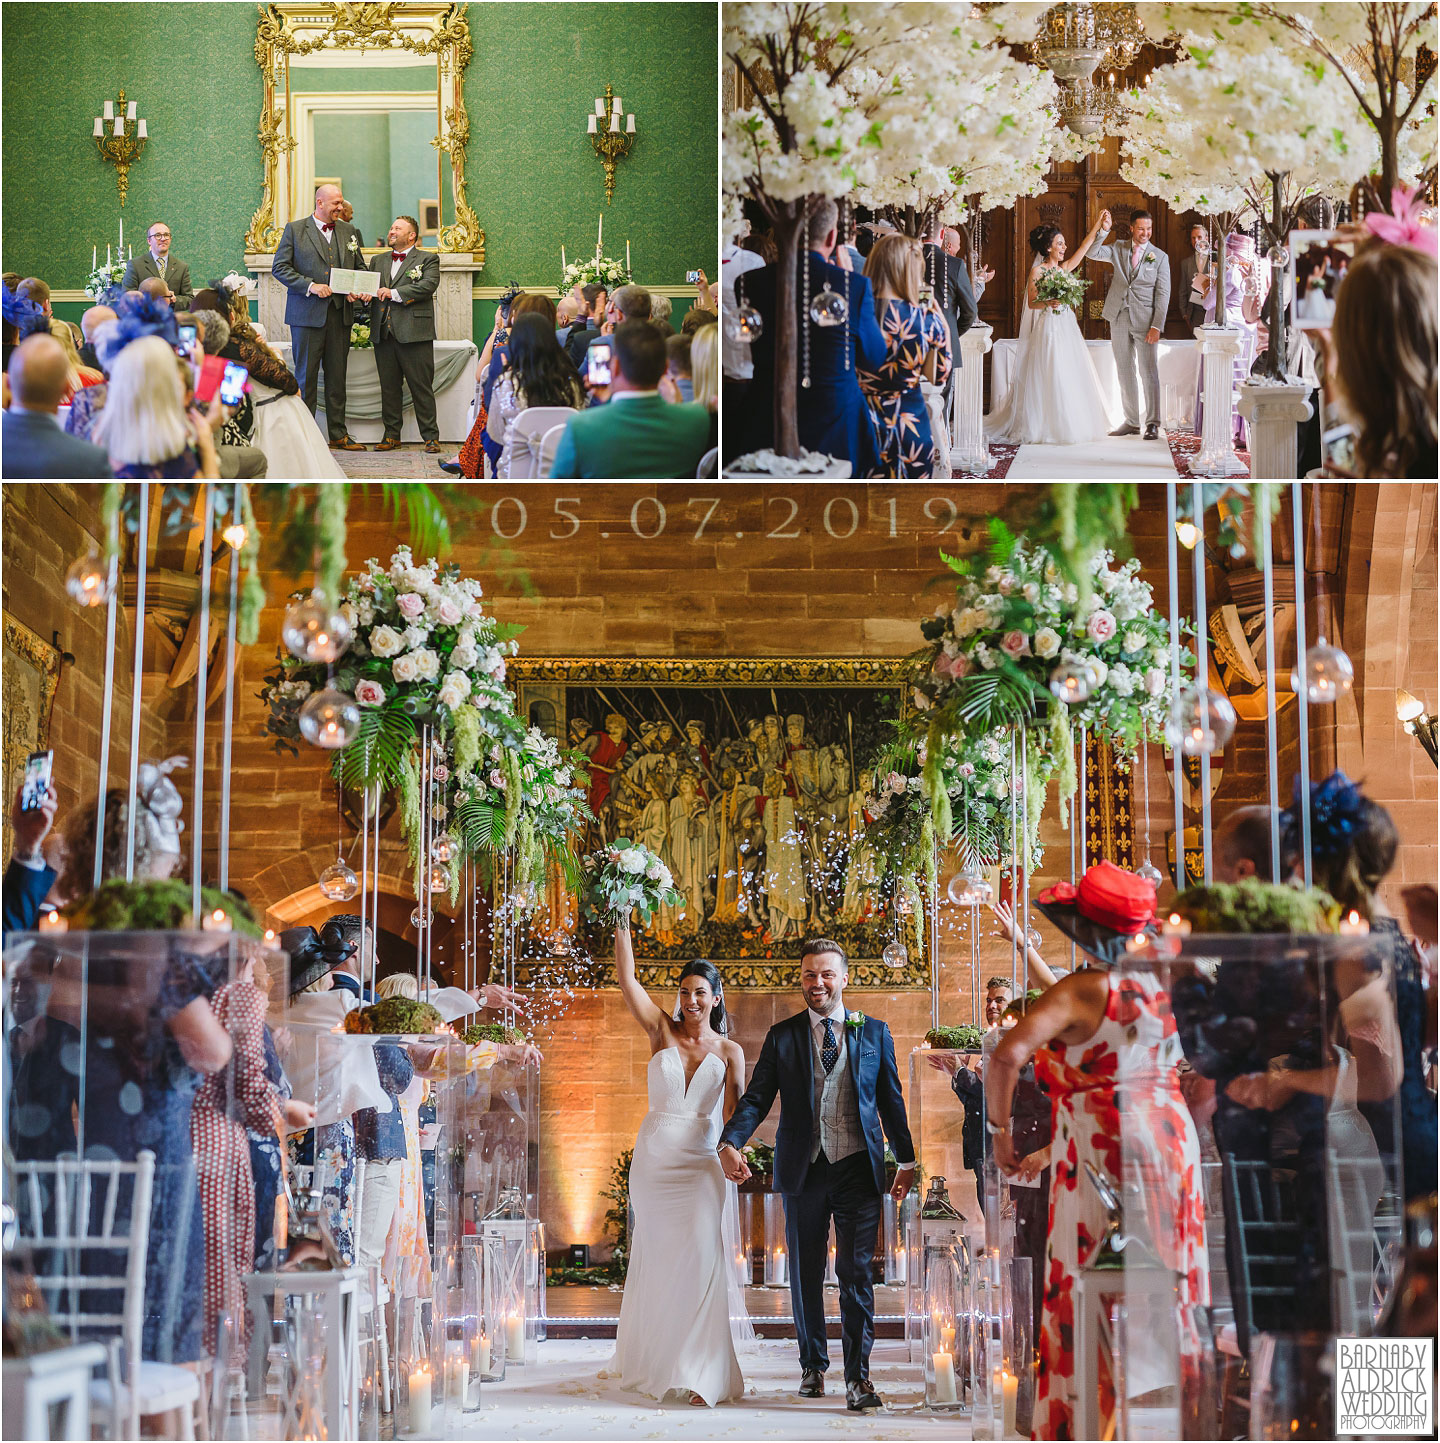 Cutlers Hall wedding, Carlton Towers wedding, Peckforton Castle Wedding